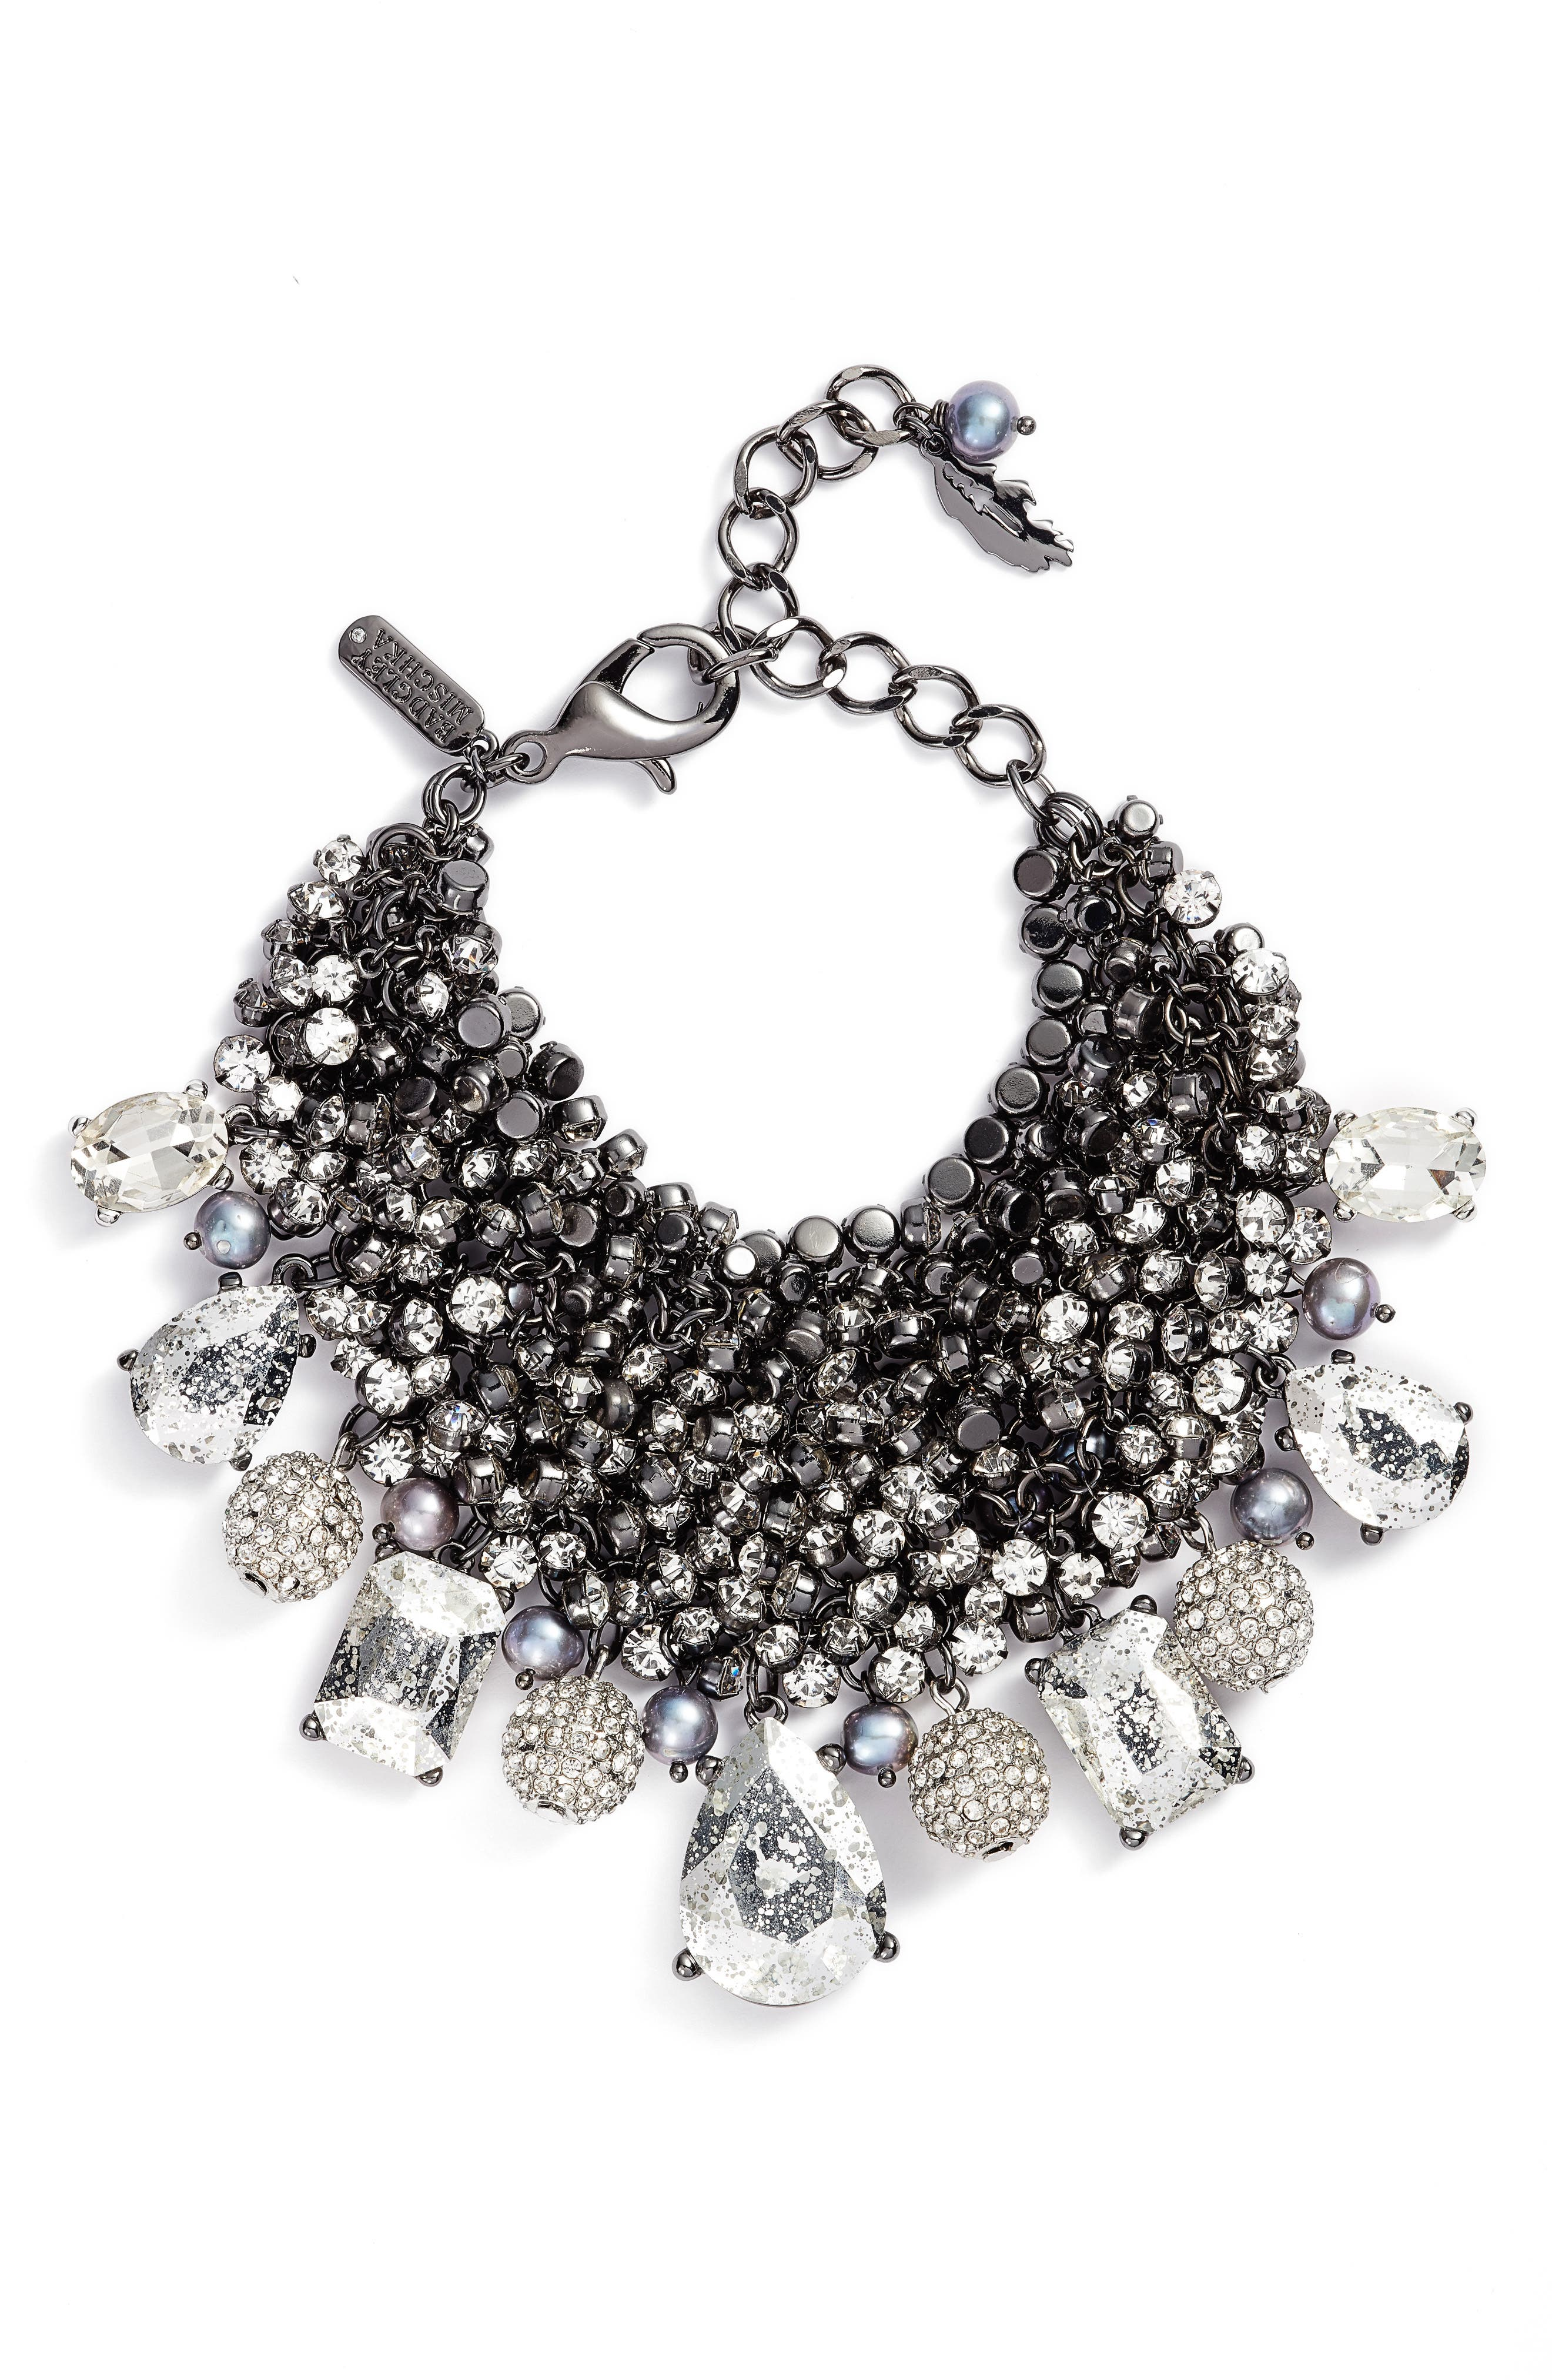 Main Image - Badgley Mischka Crystal & Pearl Cluster Bracelet